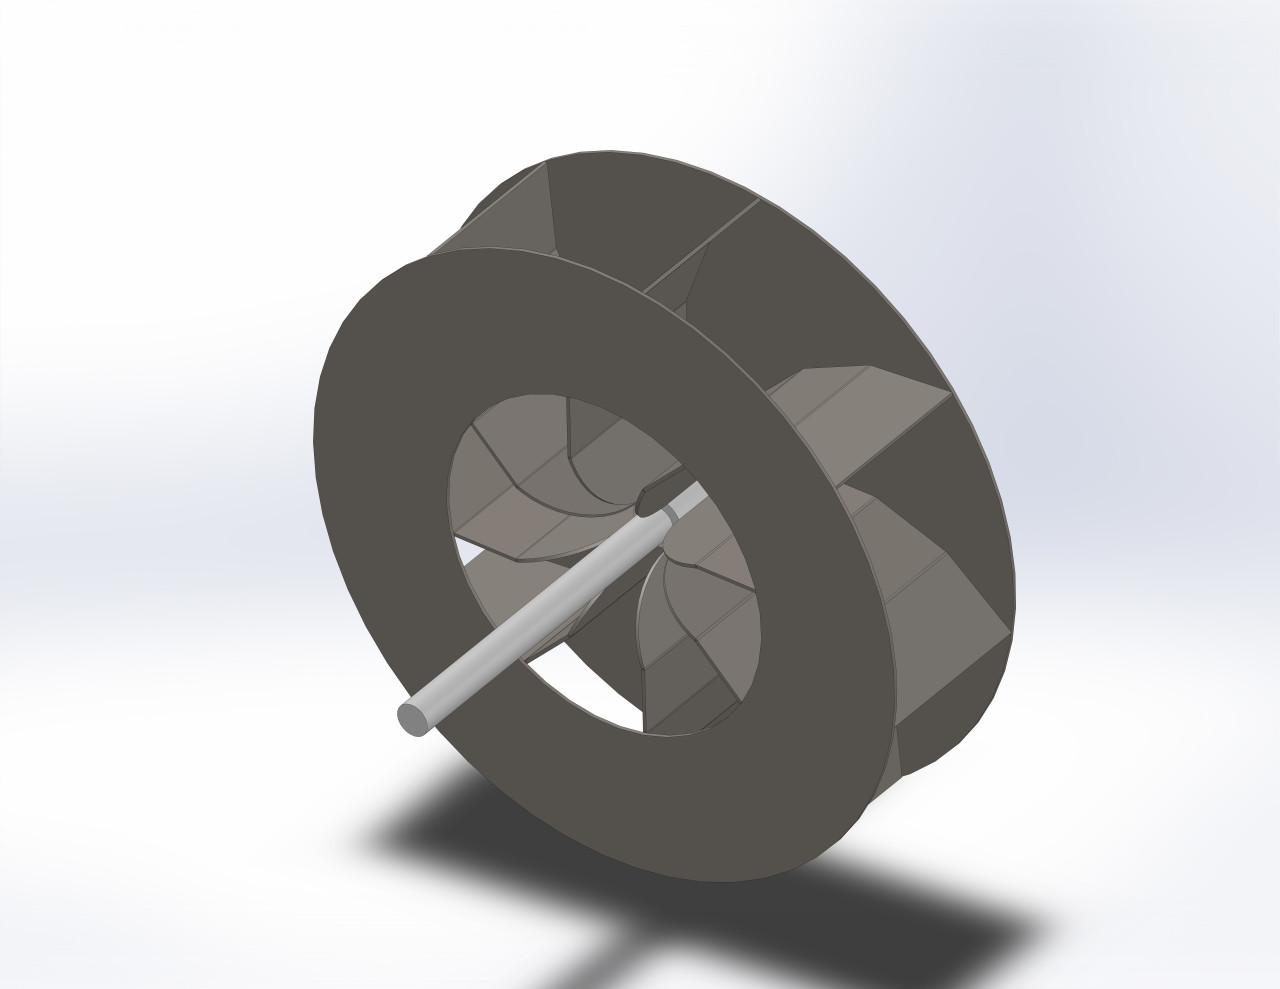 "Fan, Turbine 24"" curved blades (Fits Raptor 2 gas and Osprey 2)"